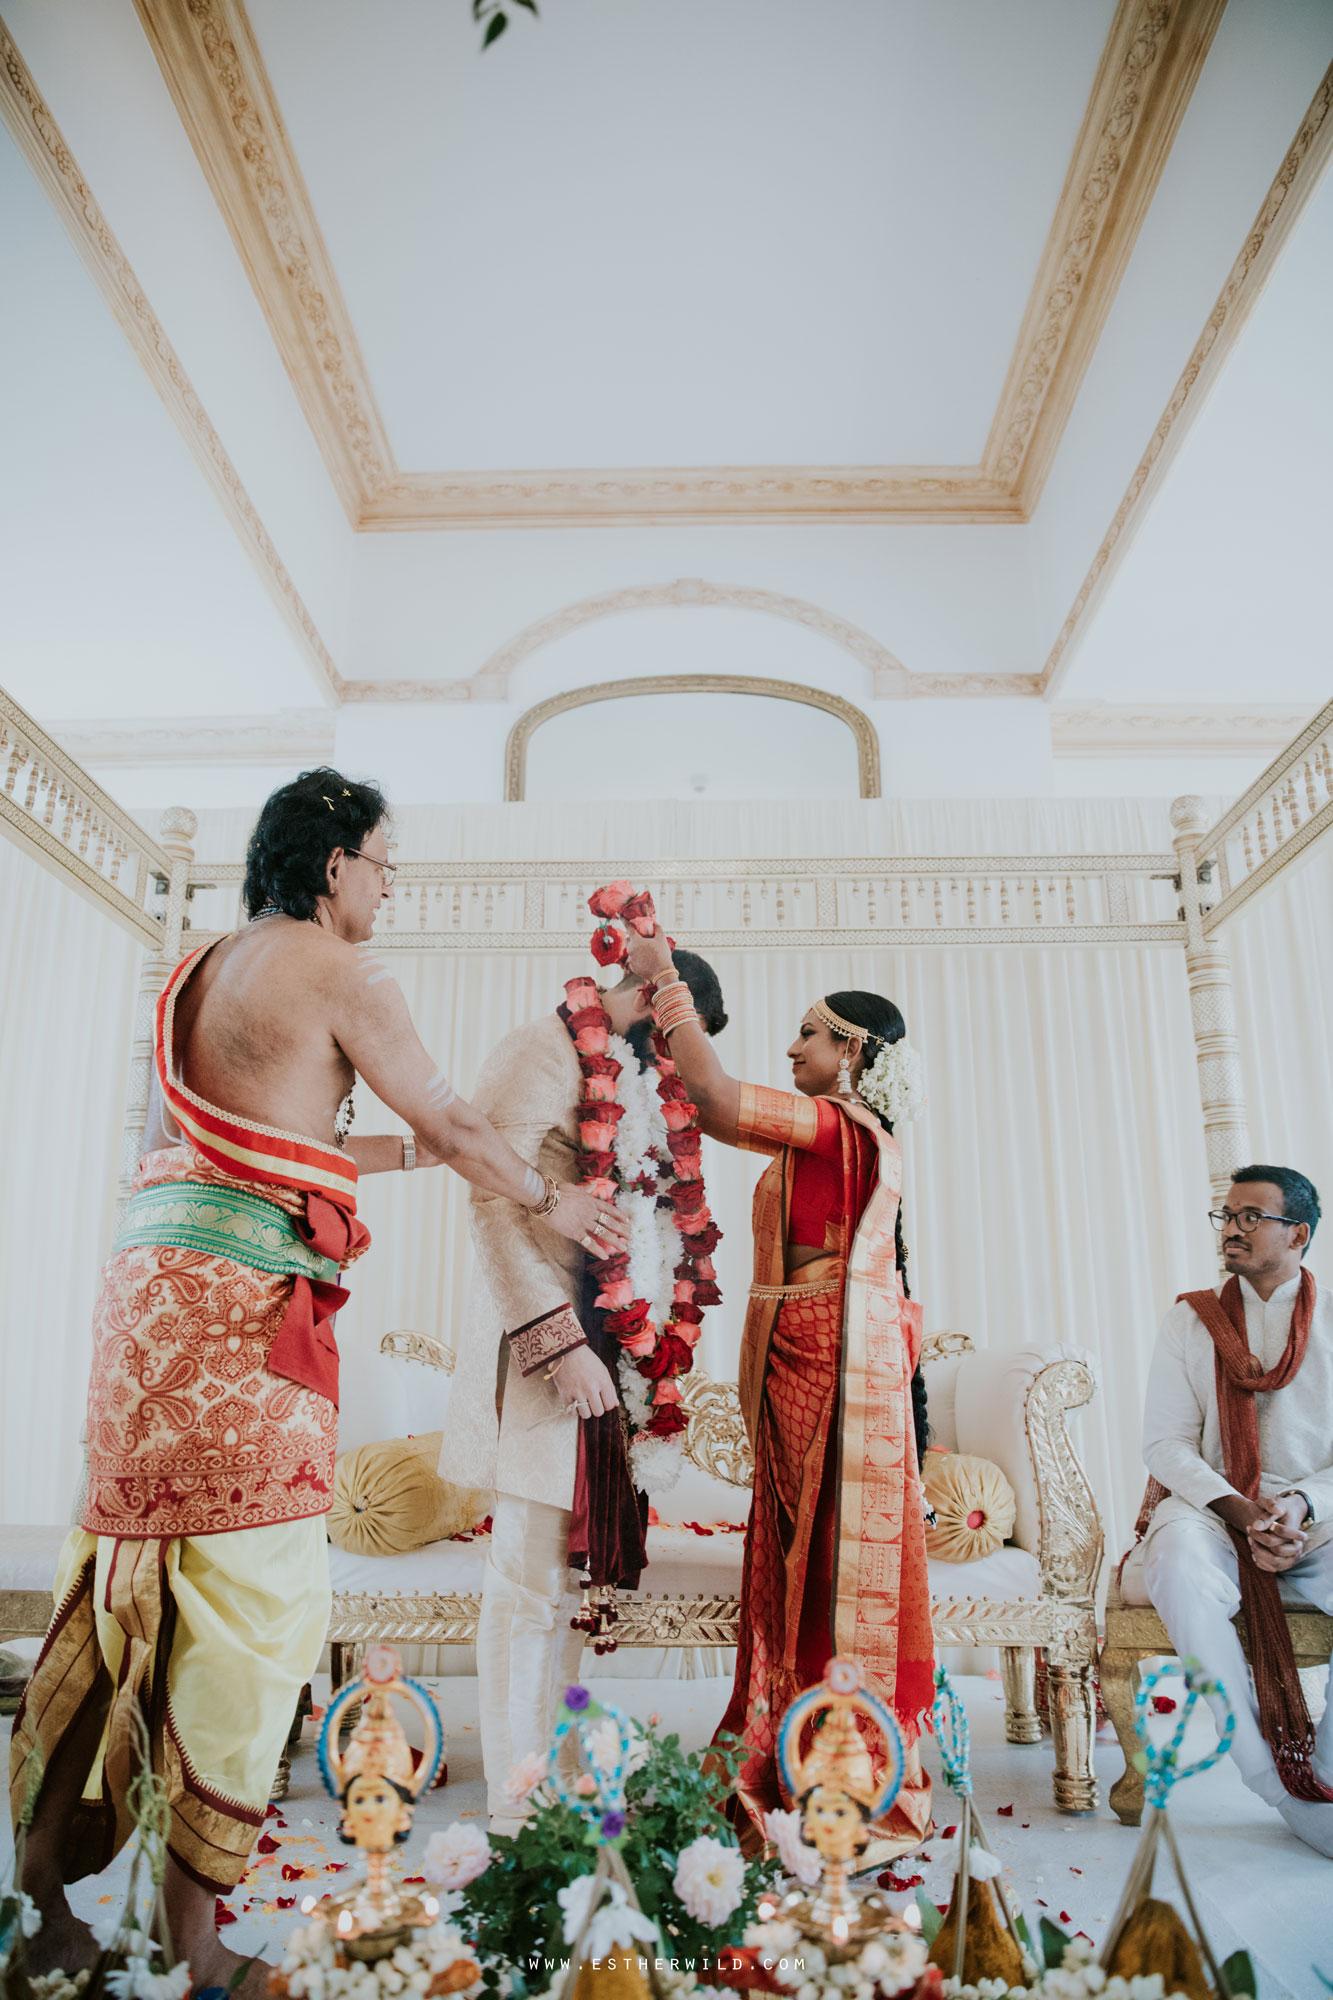 Northbrook_Park_Farnham_Surrey_London_Wedding_Hindu_Fusion_Esther_Wild_Photographer_IMG_4637.jpg